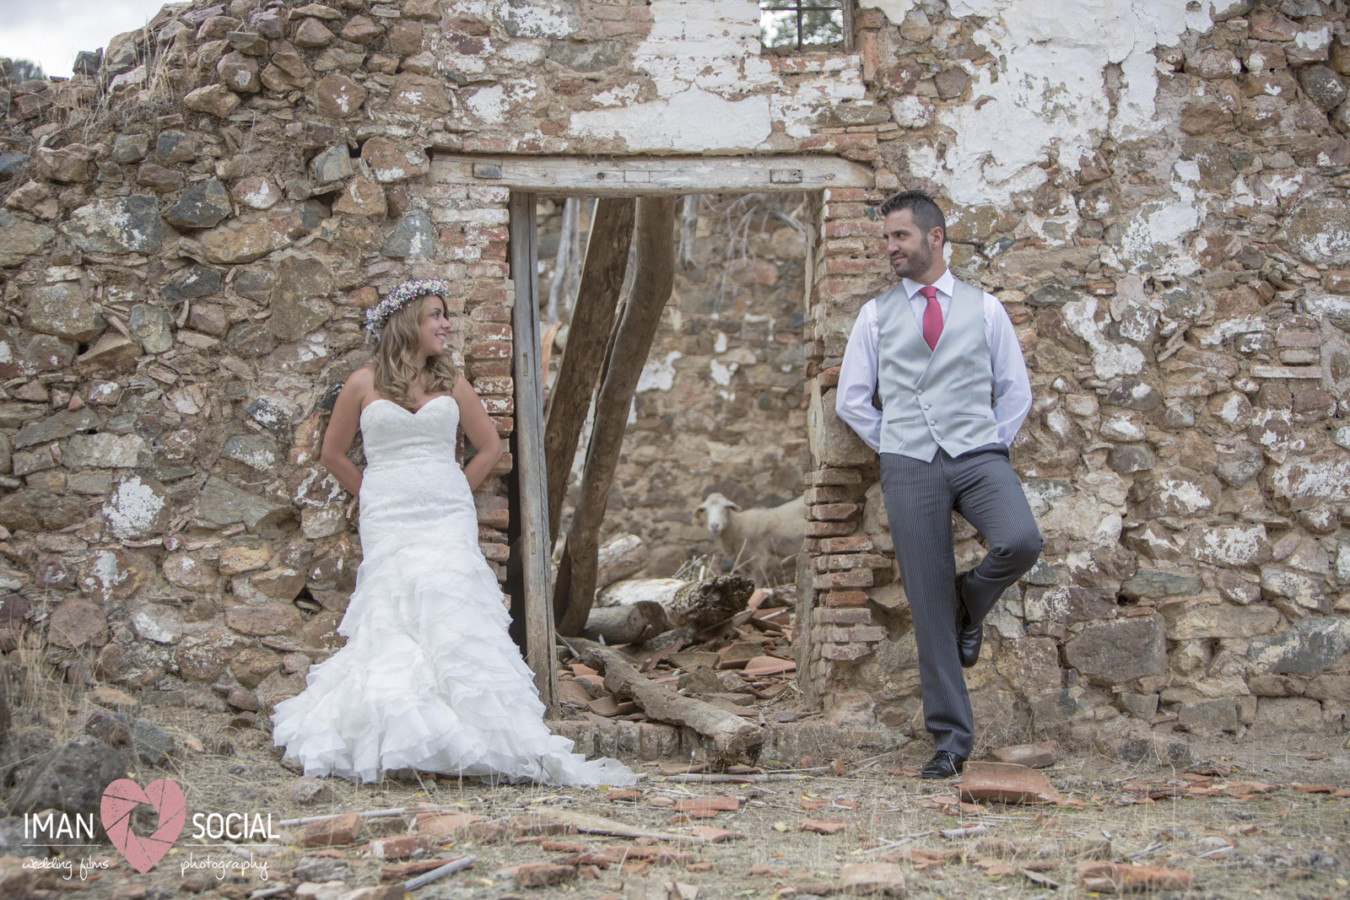 77B9992 Juan Antonio y Mónica - Postboda - video boda cordoba